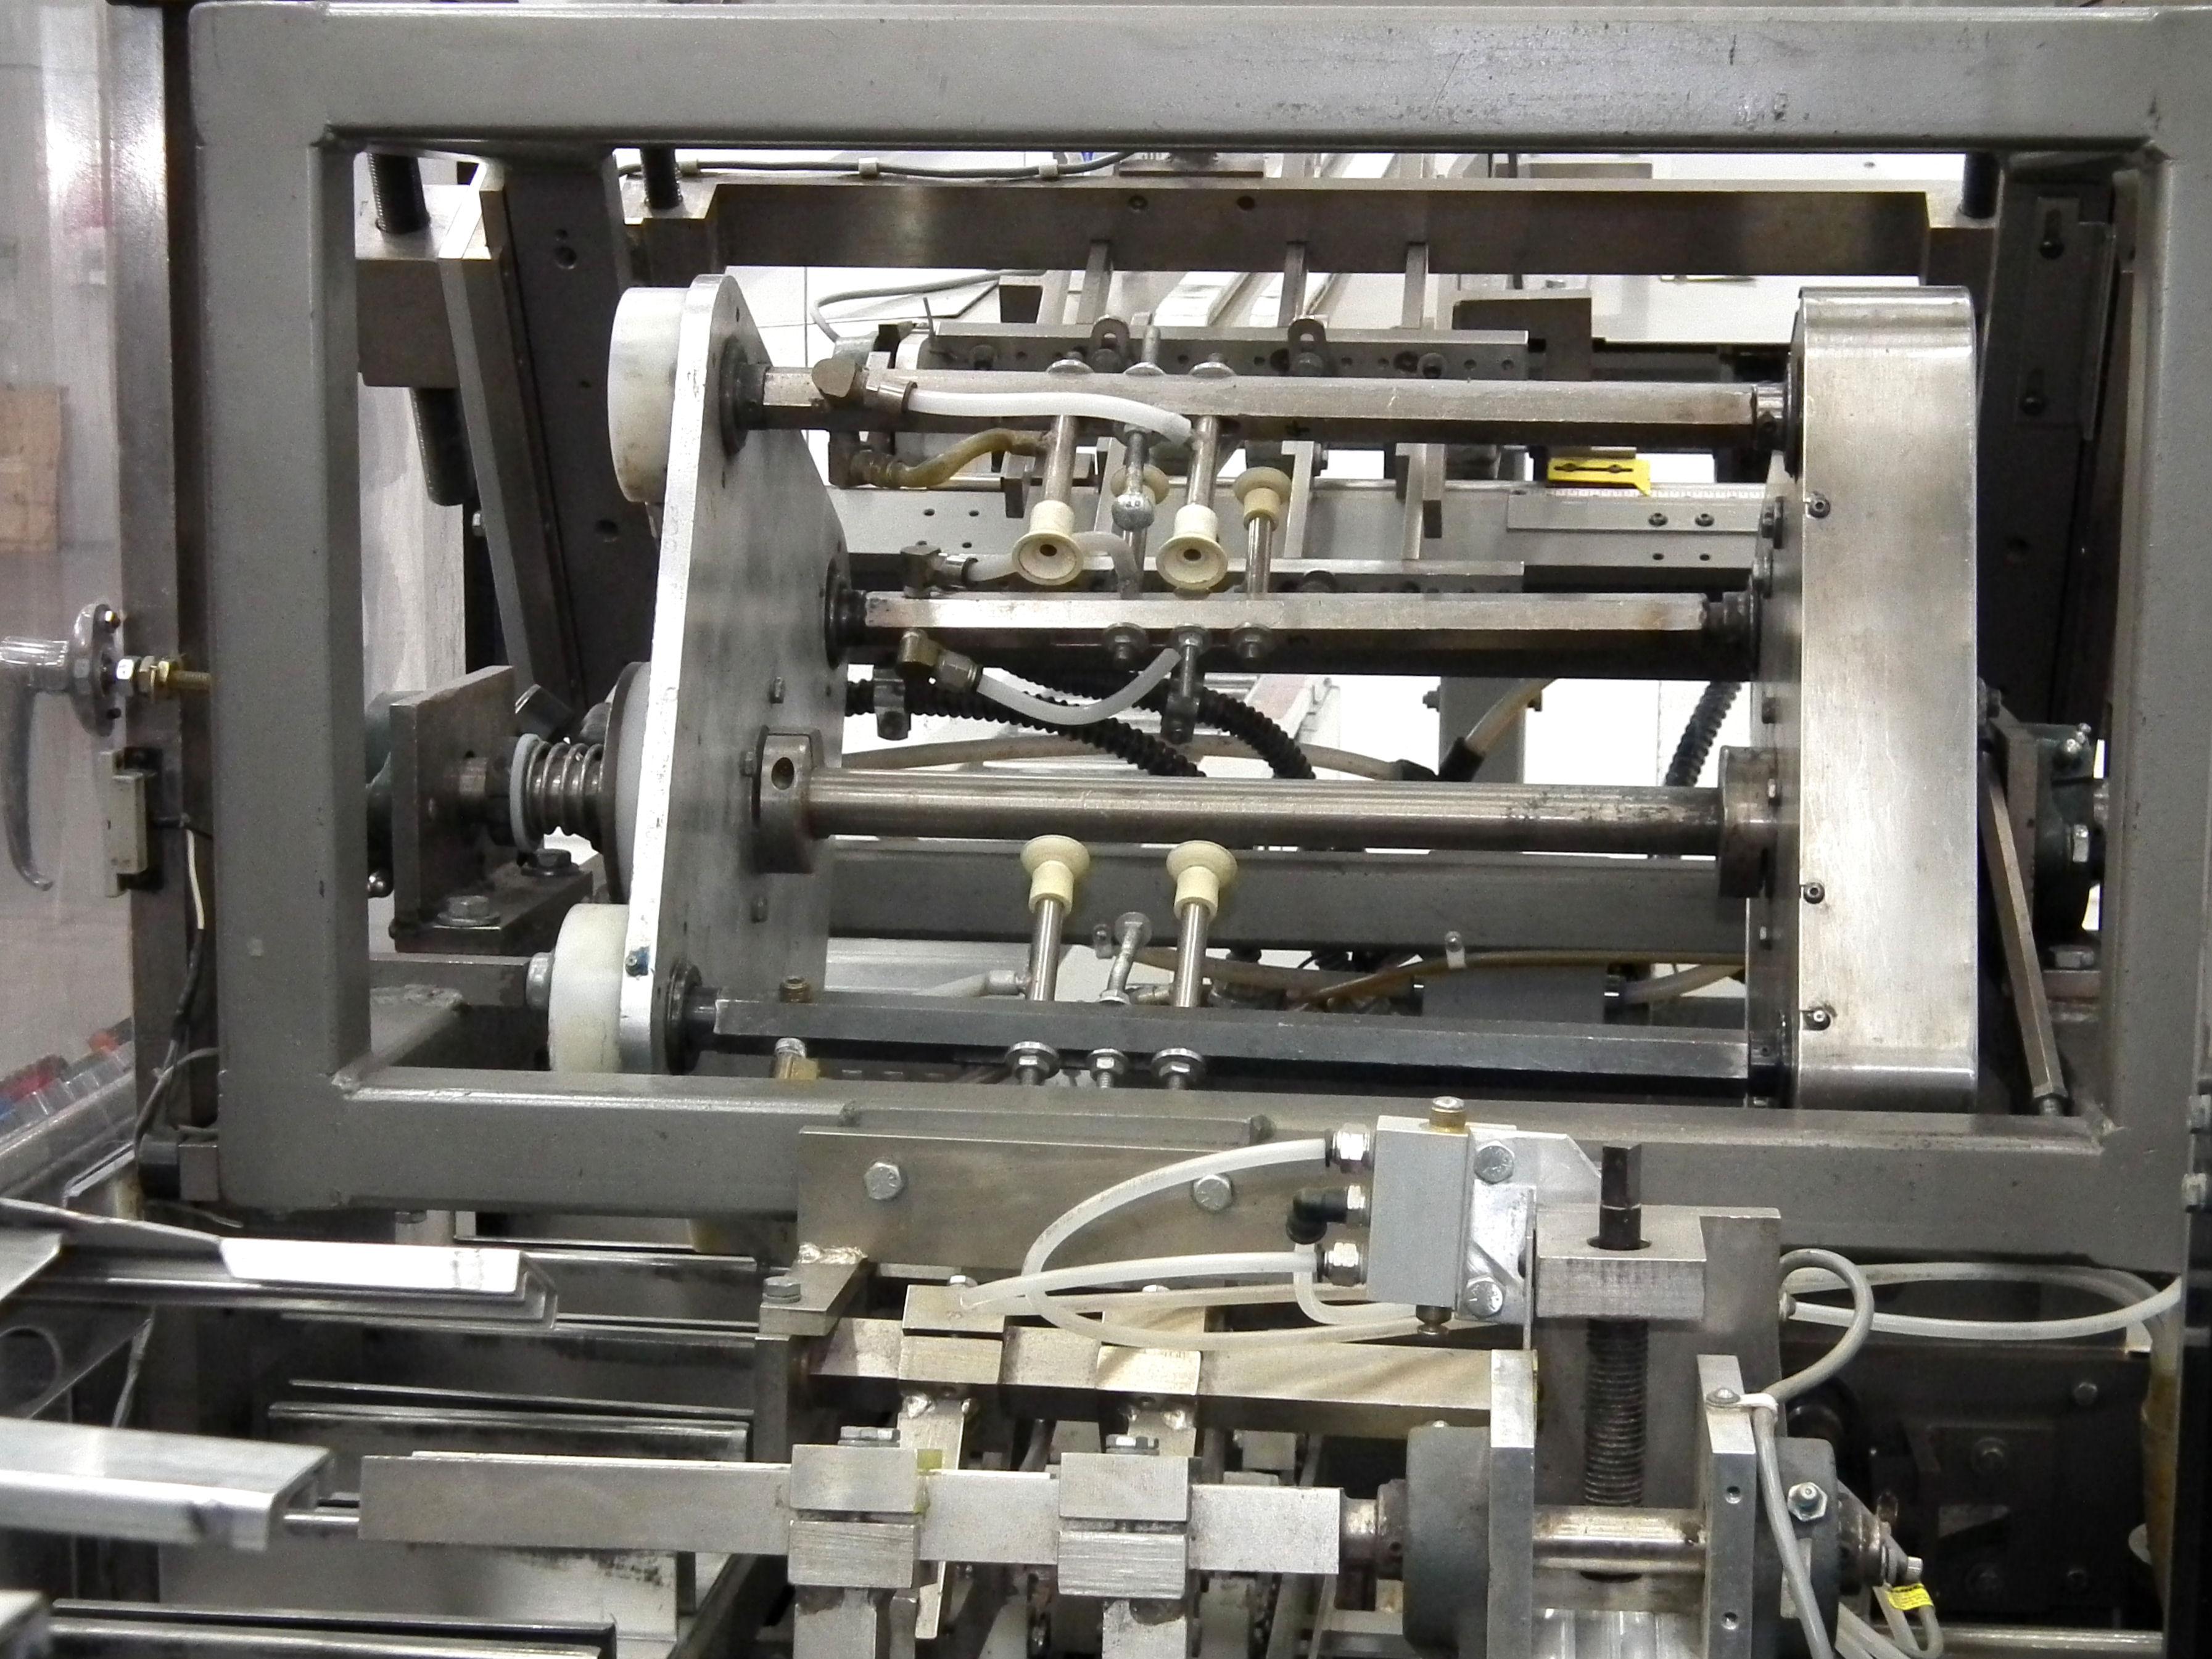 Dimension 800 Overhead Confinement Glue Cartoner B4111 - Image 6 of 17